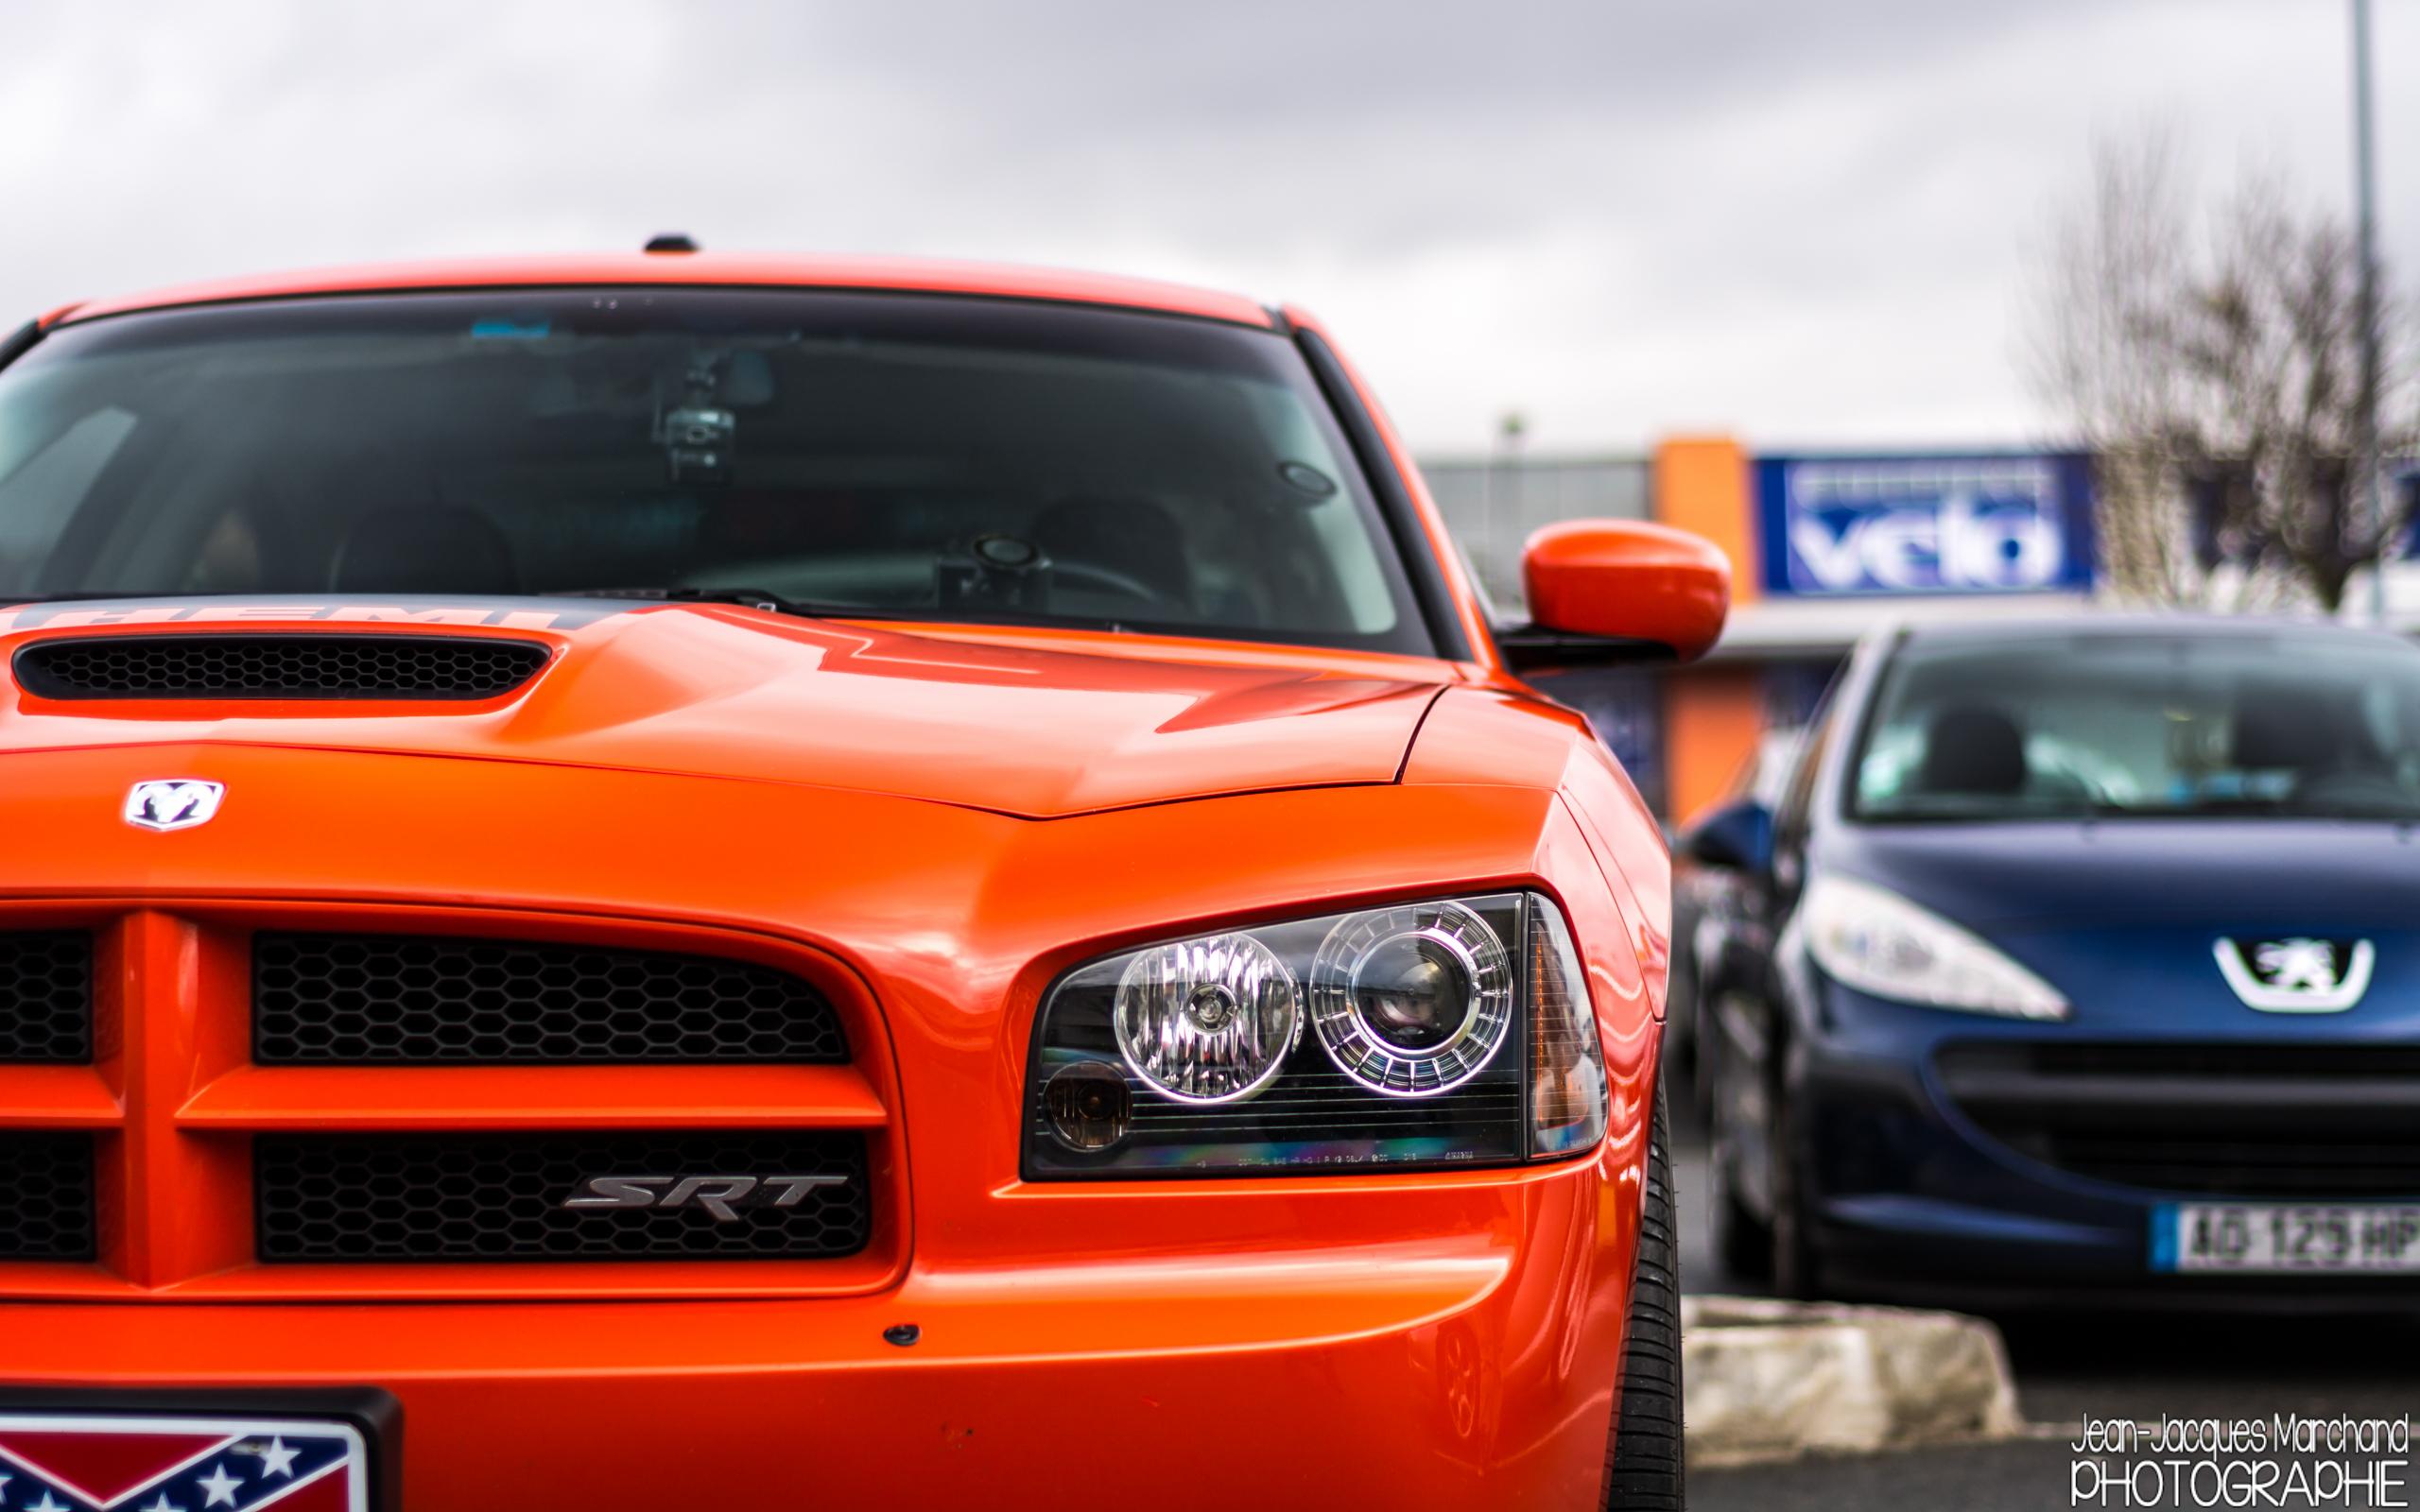 Wallpaper : auto, orange, Paris, cars, car, america, us, Nikon ...